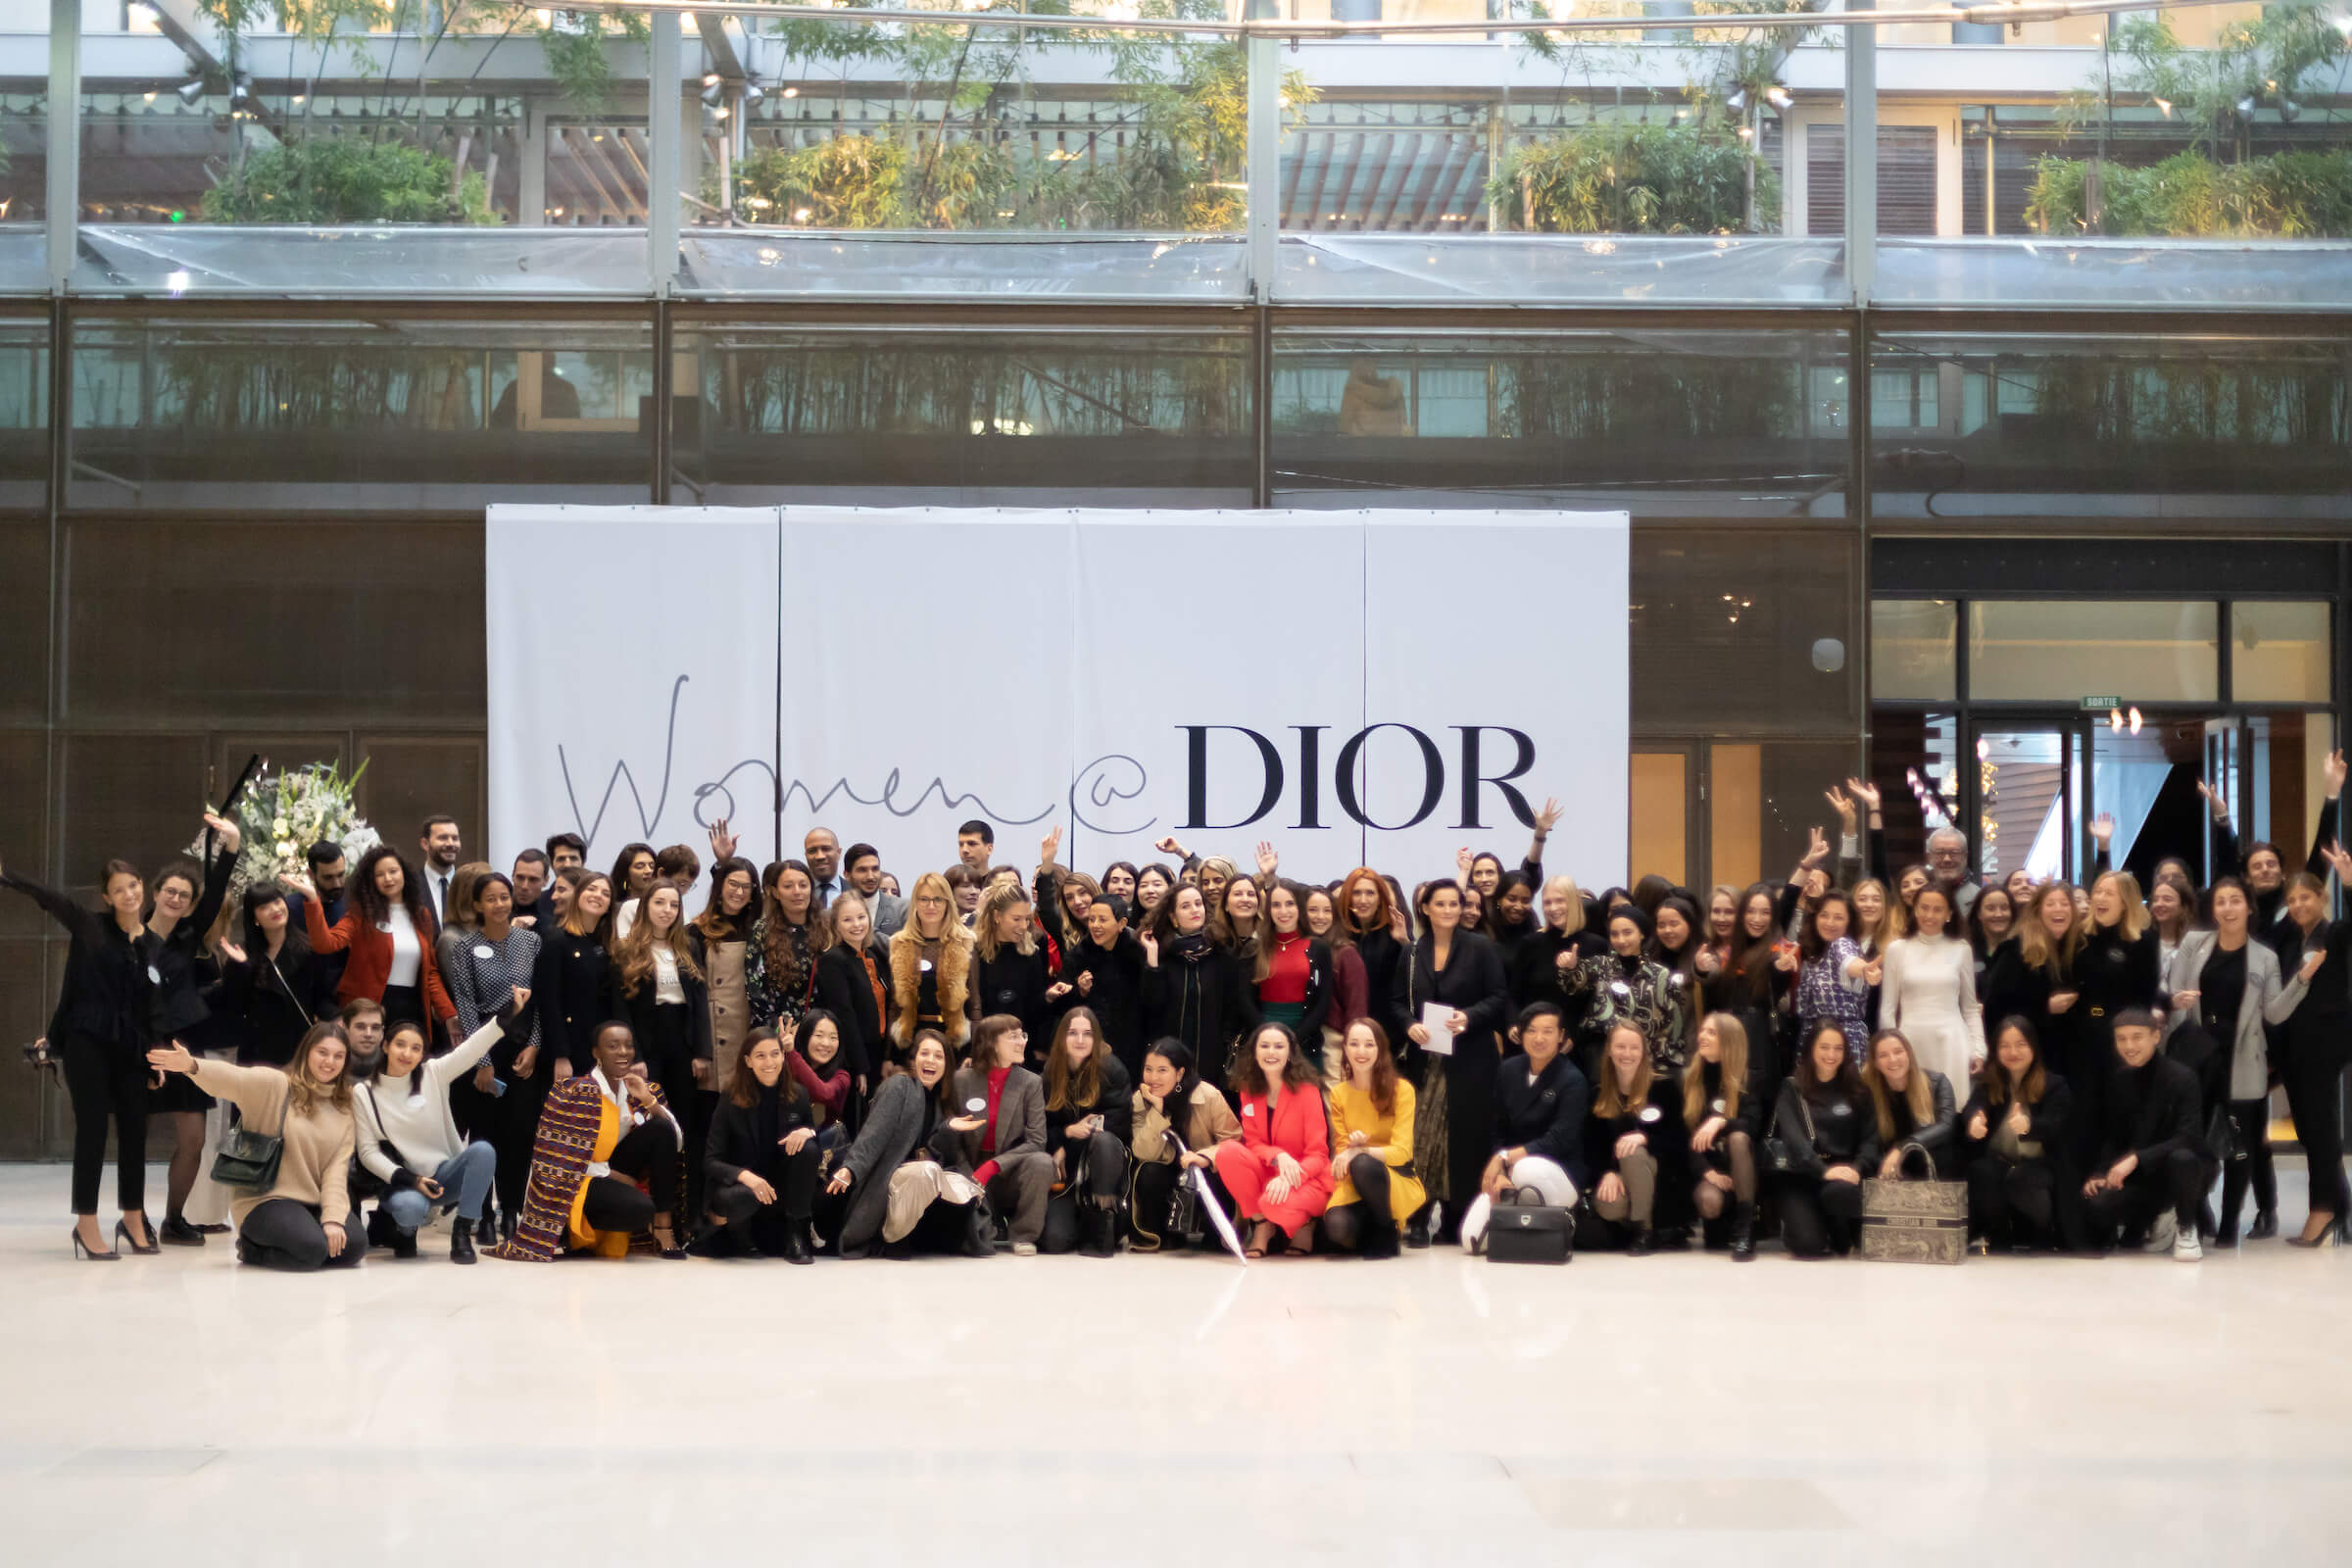 Dior seleciona brasileiras